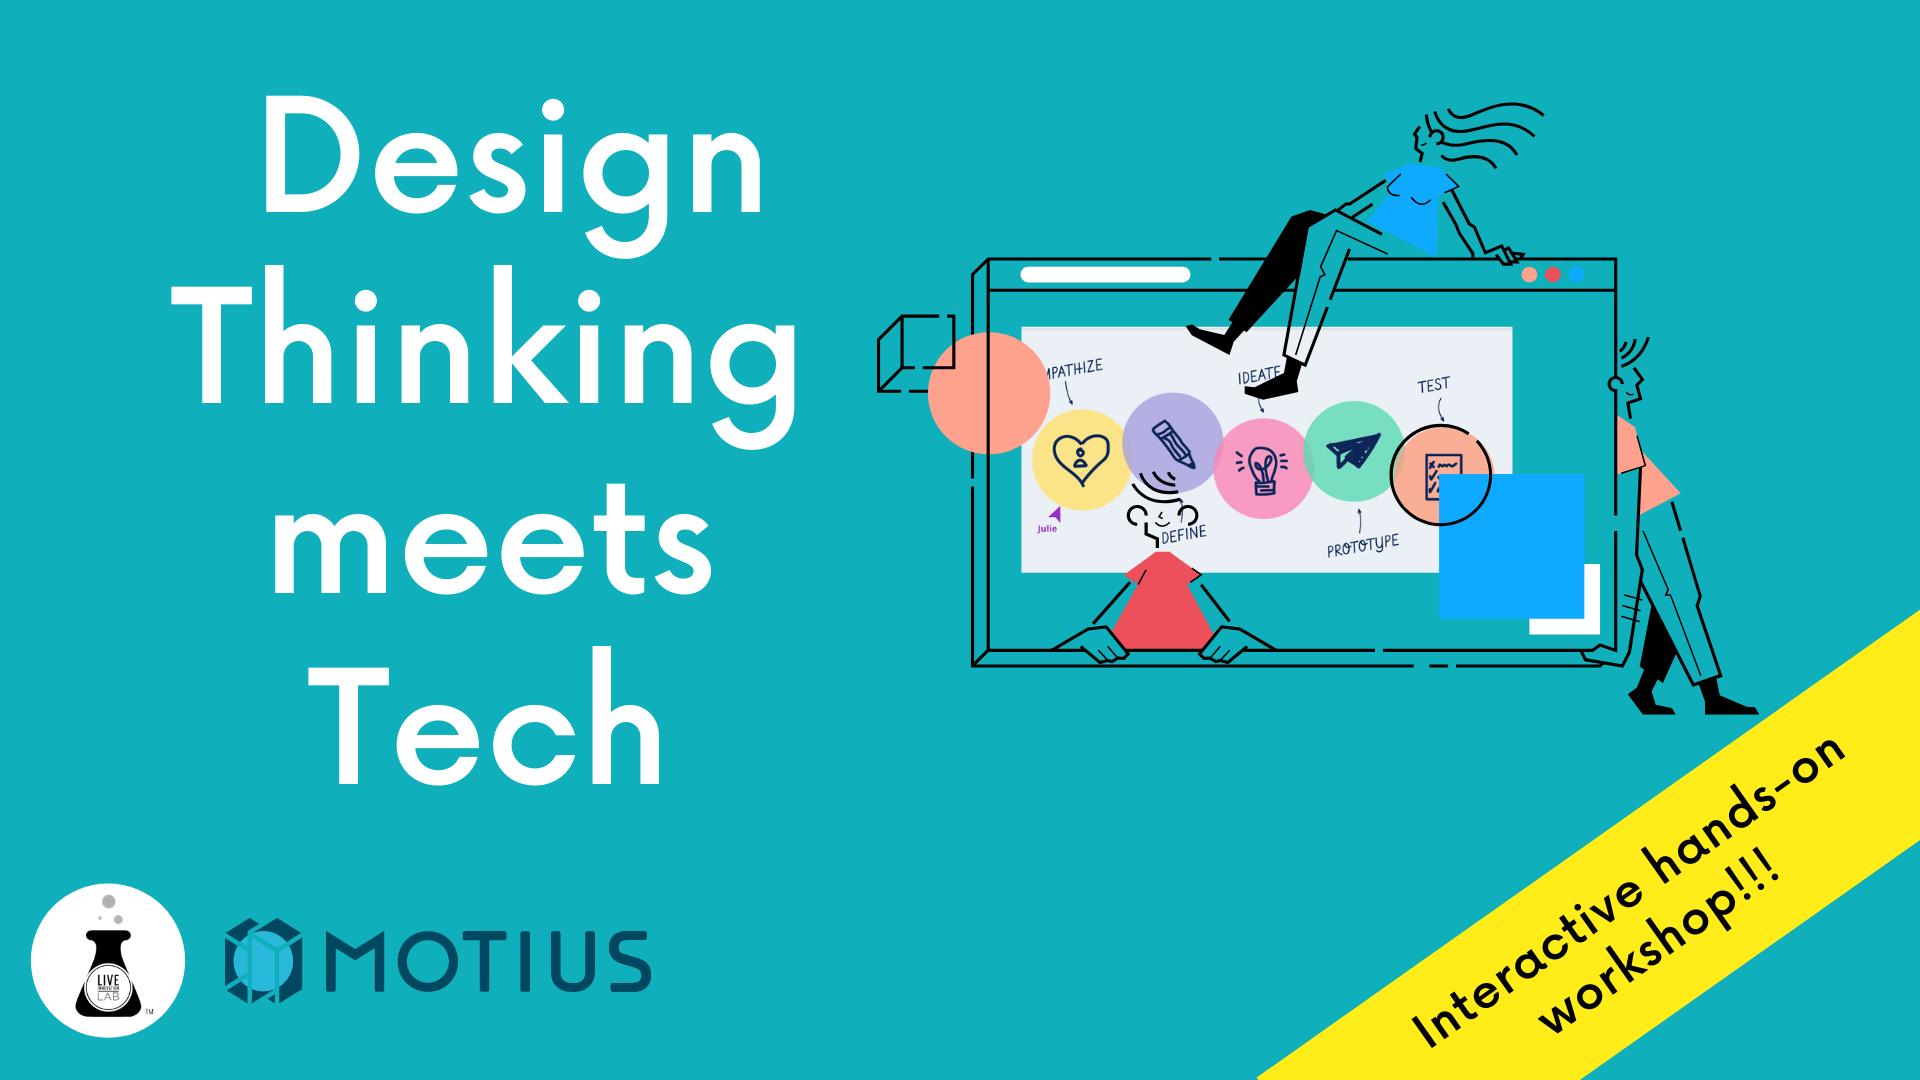 Web_Design Thinking meets Tech w Motius Logo